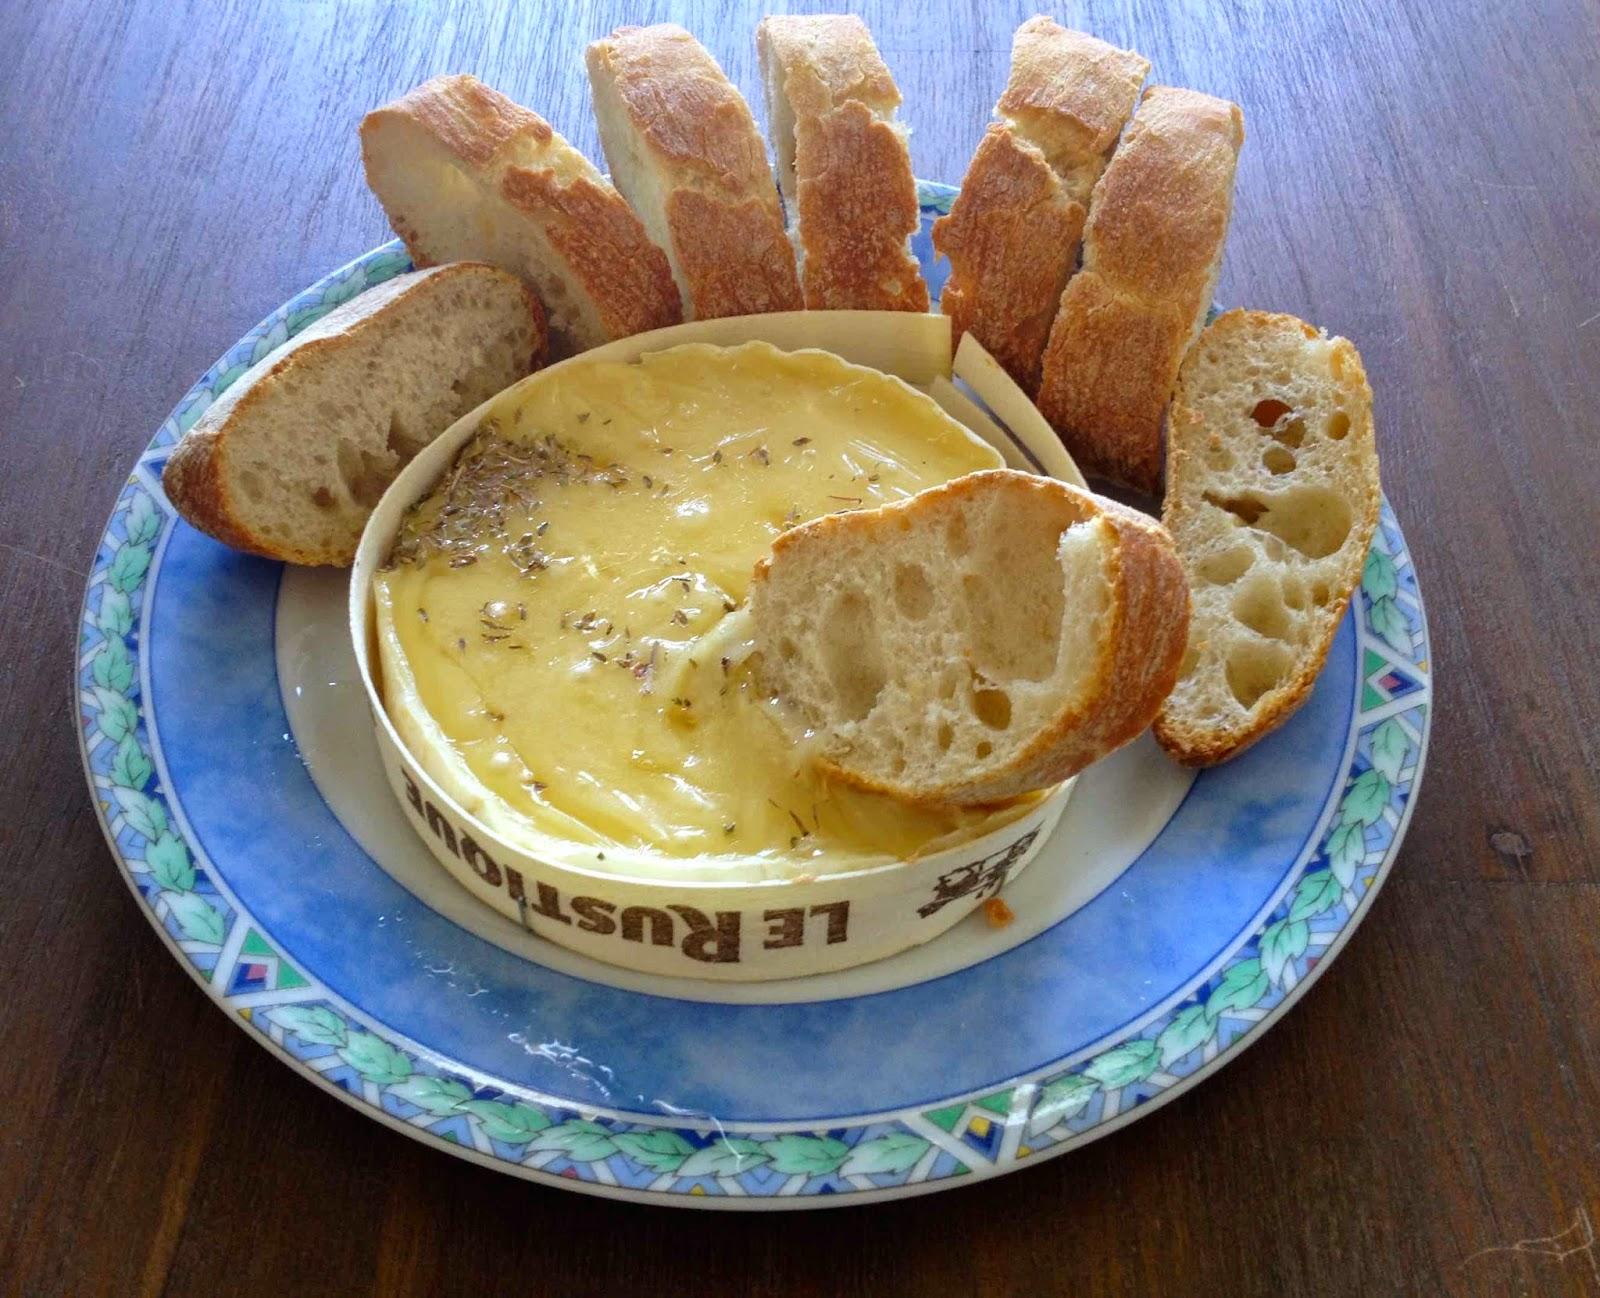 Camembert kaasfondue